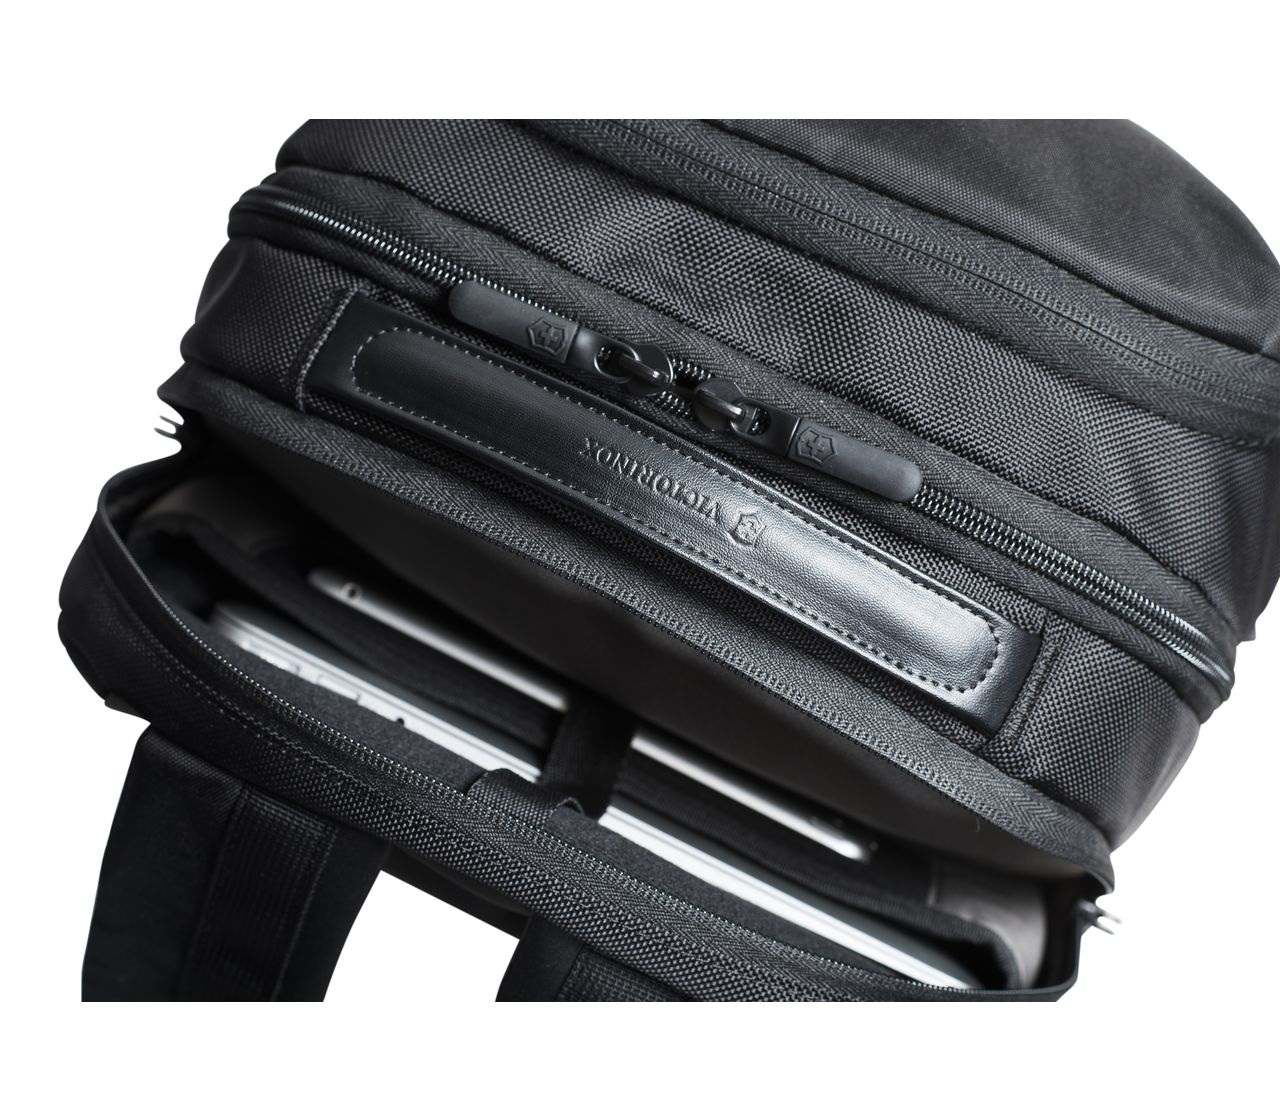 Victorinox Deluxe Travel Laptop Backpack In Black 602155